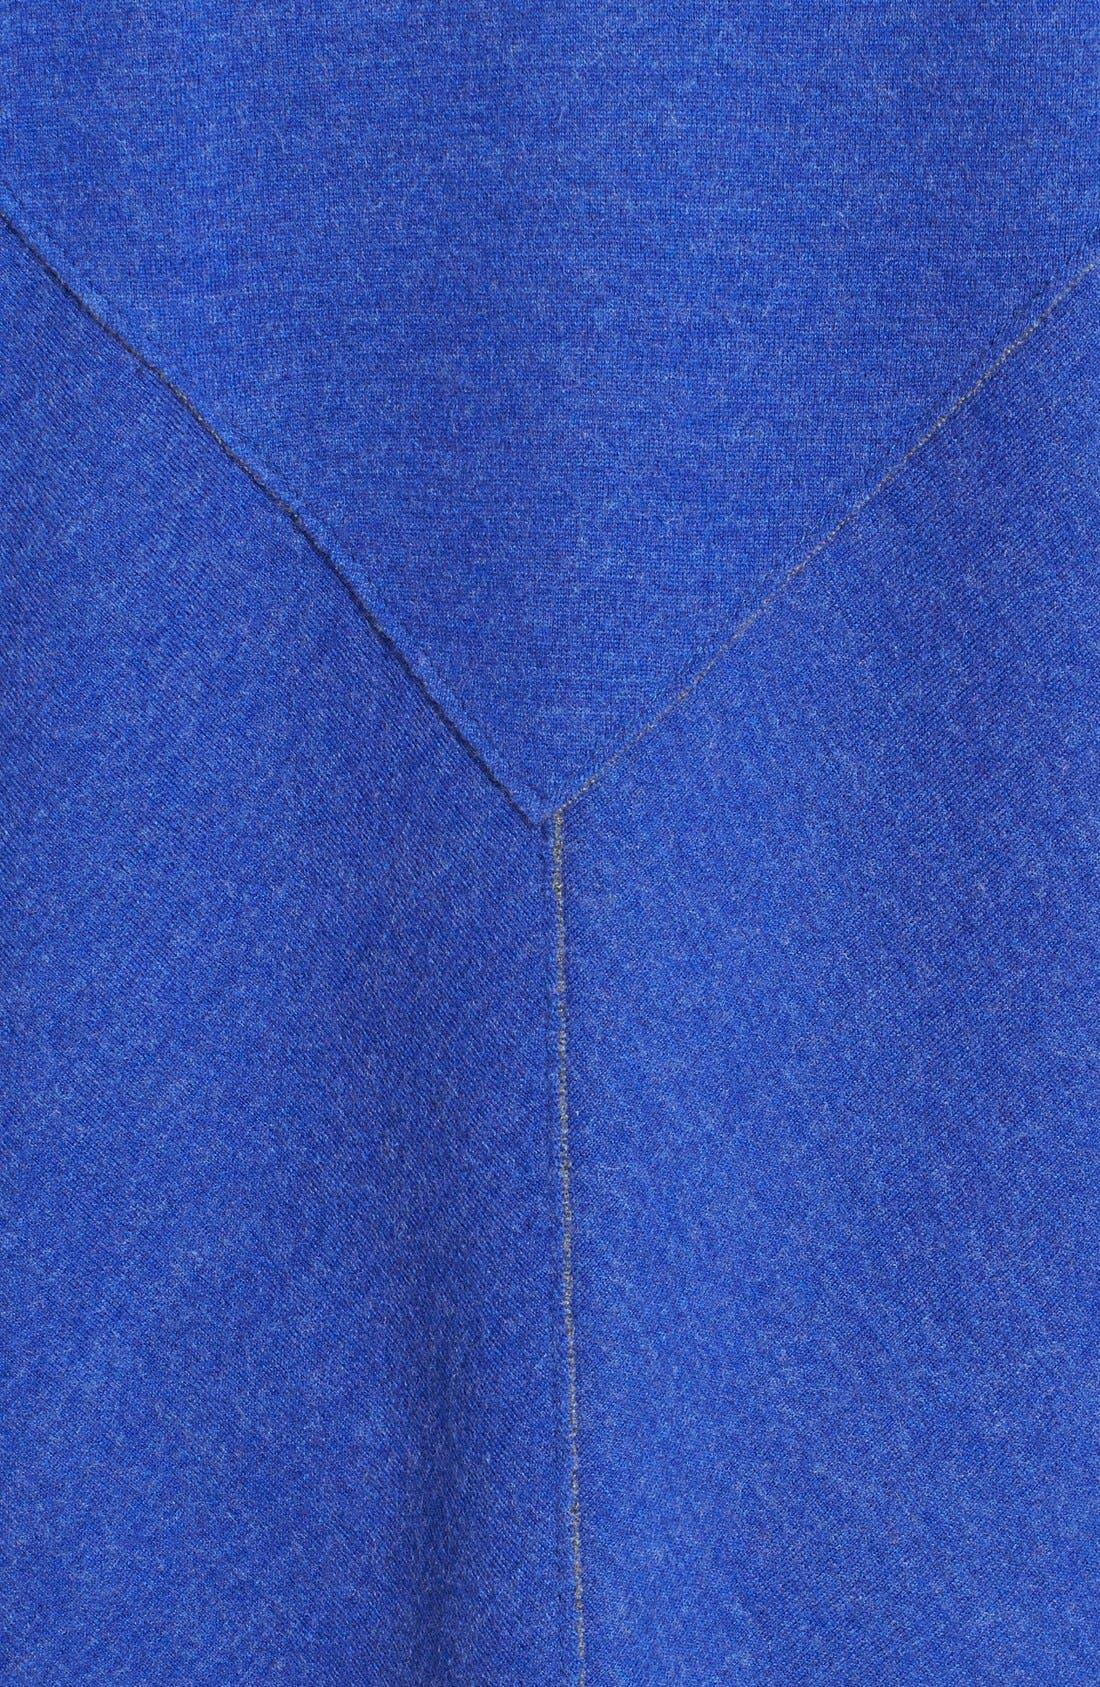 Alternate Image 3  - Eileen Fisher Double Knit Merino Blend Shaped Cardigan (Plus Size)